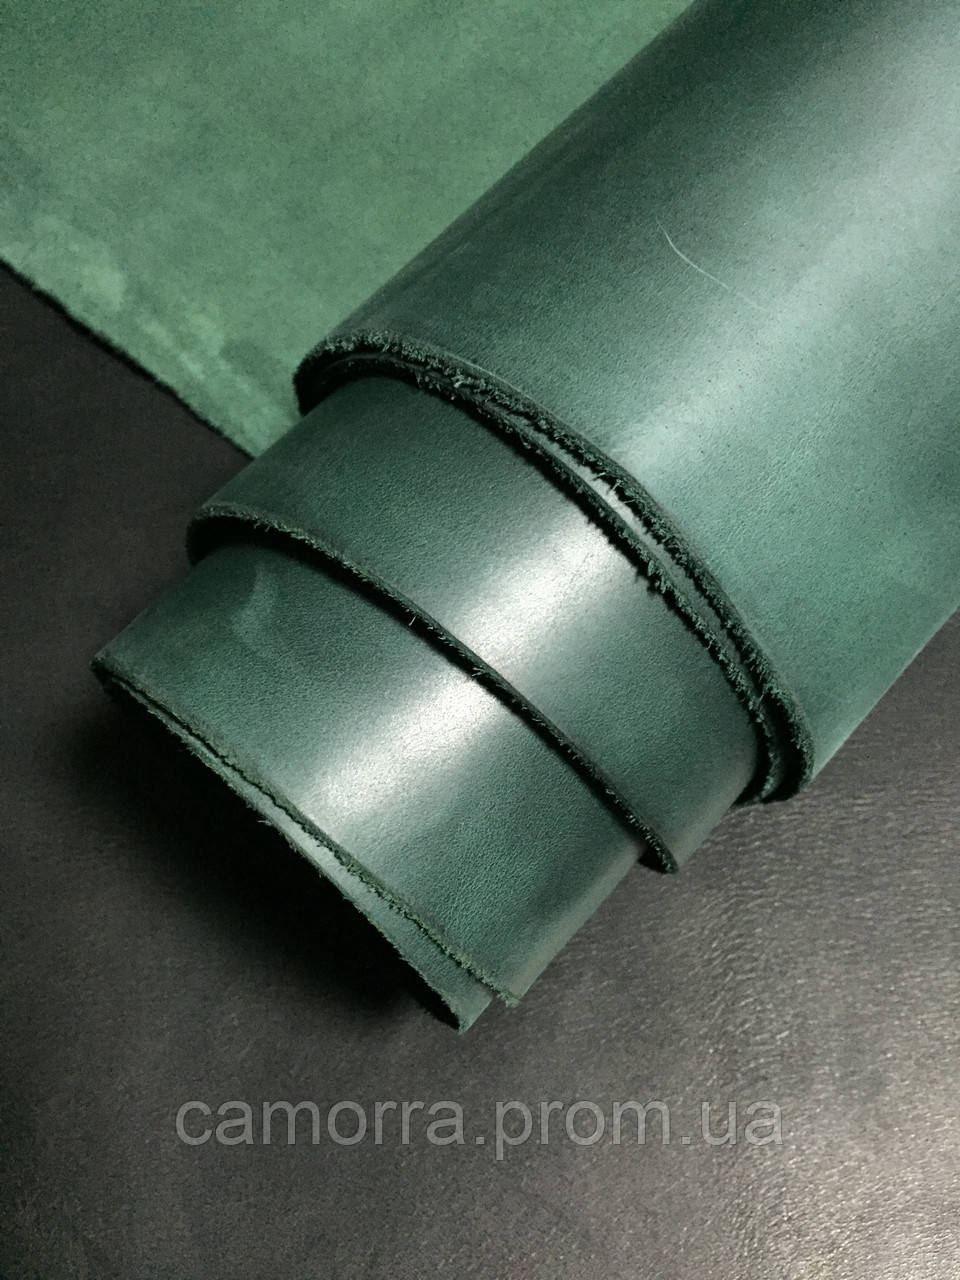 Кожа Крейзи Хорс зеленый